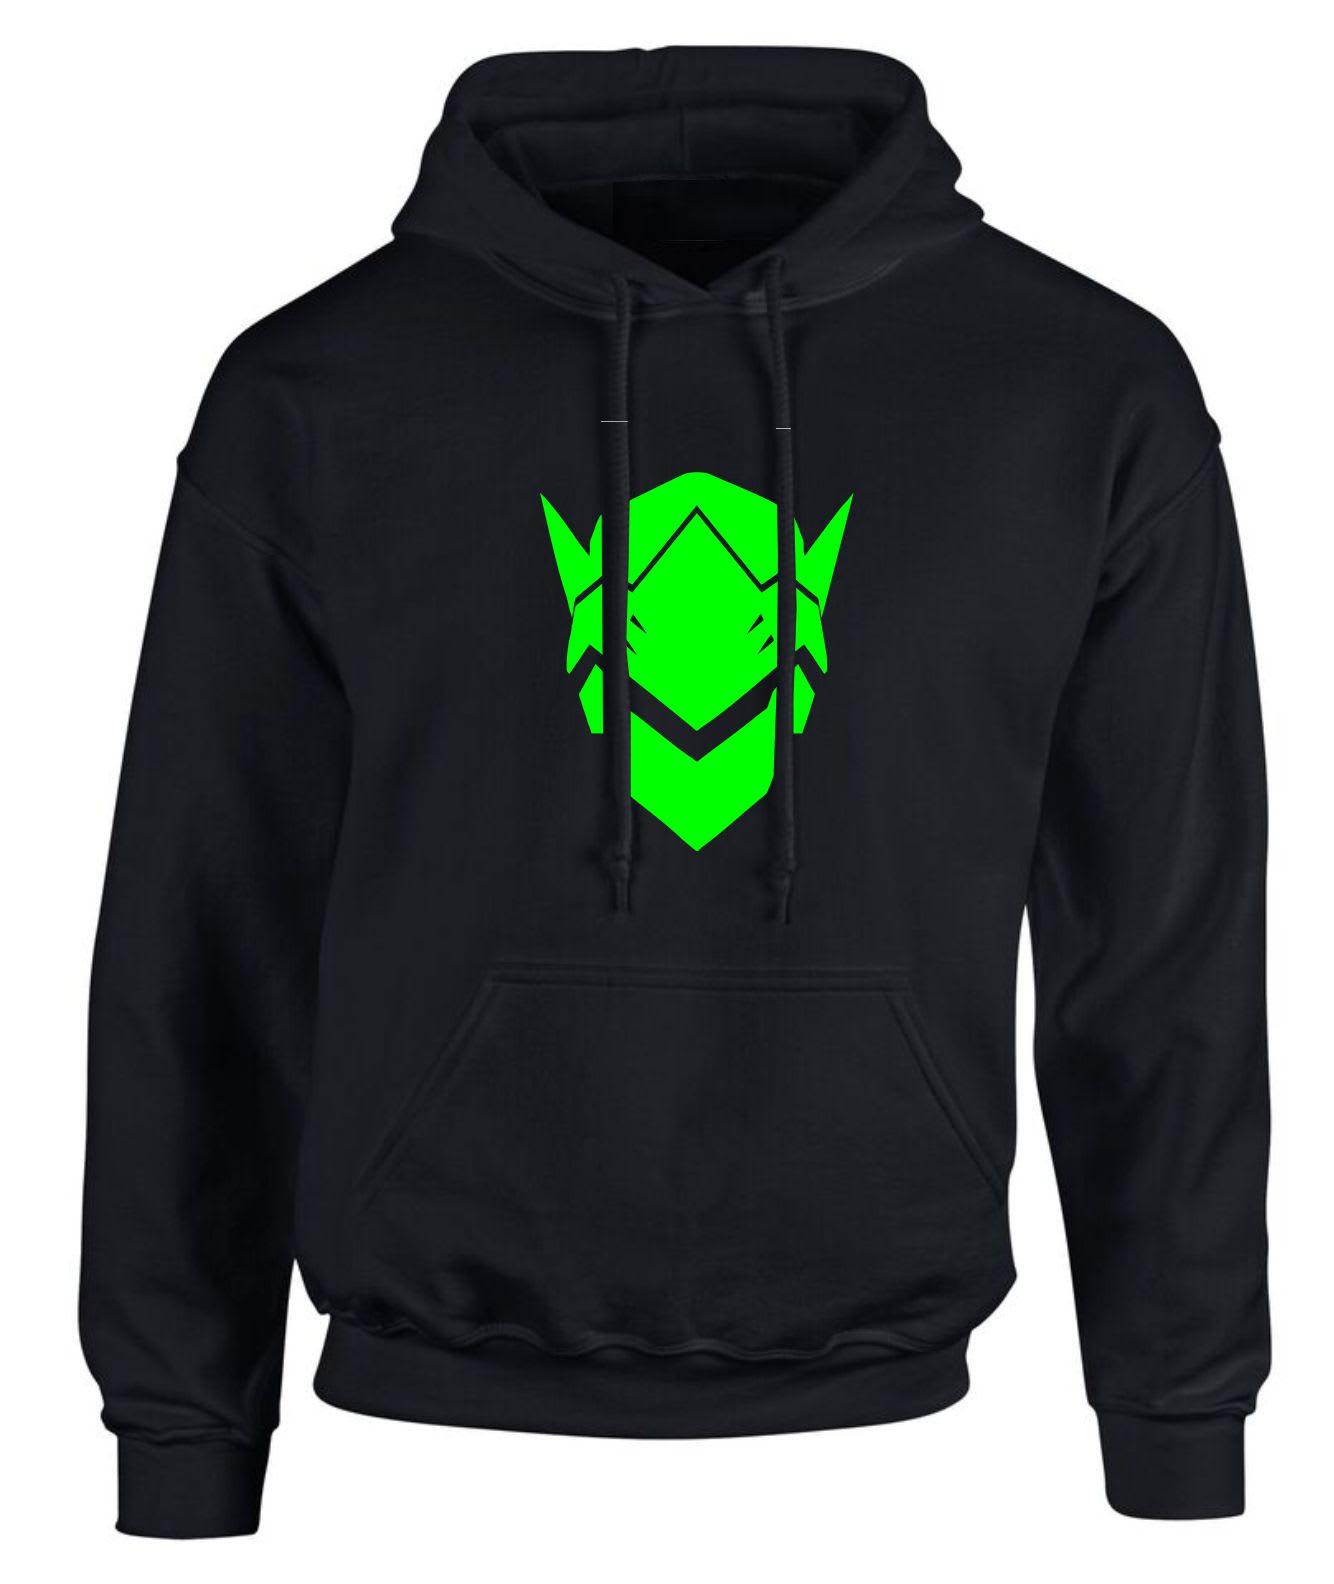 Overwatch Genji Hoodie